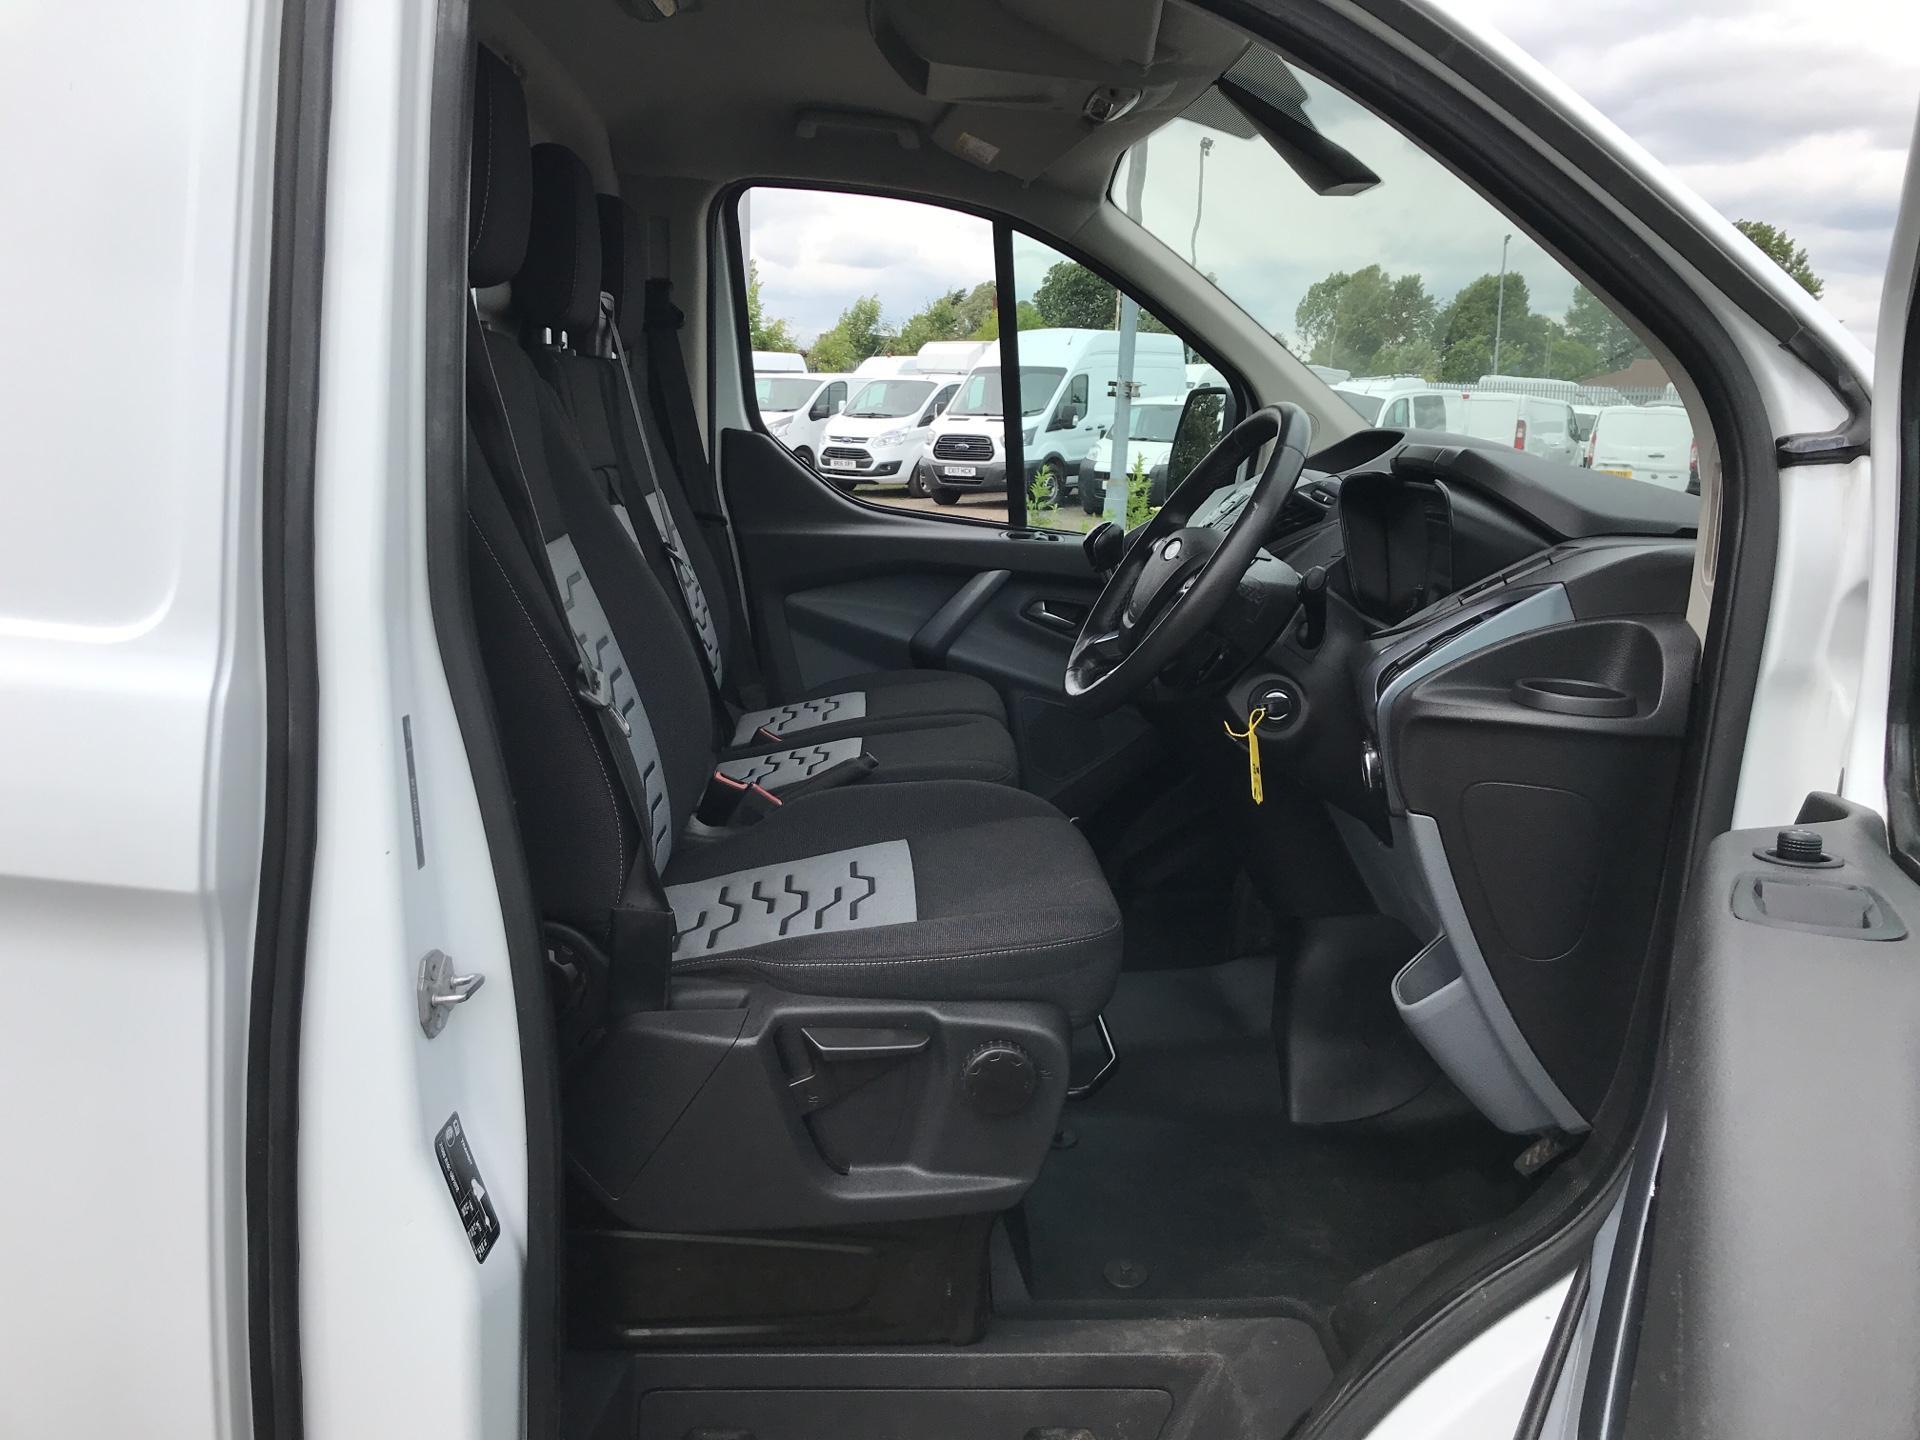 2016 Ford Transit Custom 290 L1 DIESEL FWD 2.2 TDCI 125PS LOW ROOF LIMITED VAN EURO 5 (EA16DWL) Image 9